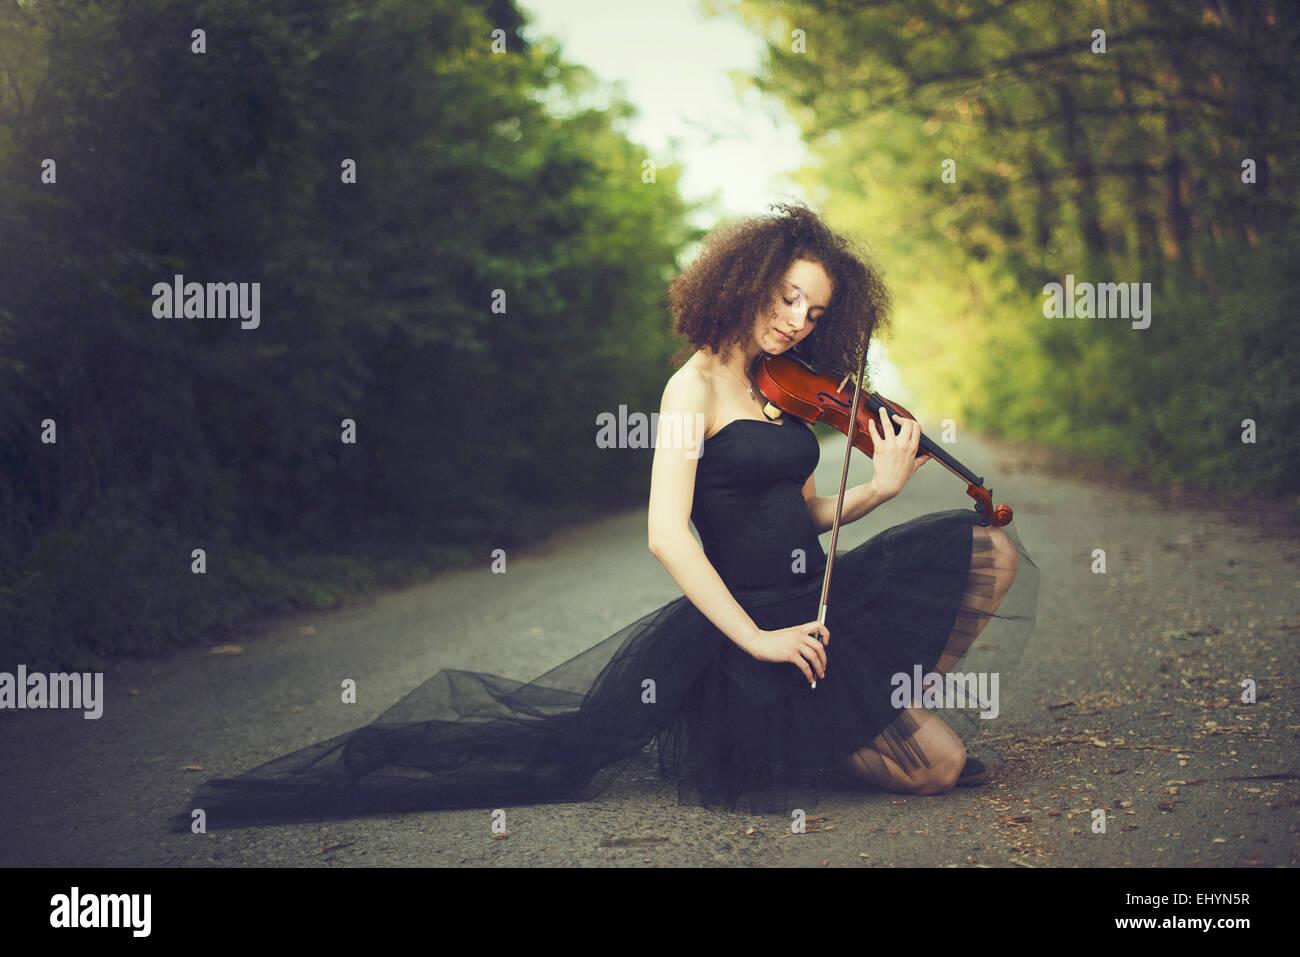 Traurige junge Frau mit dem Geigenspiel Stockbild